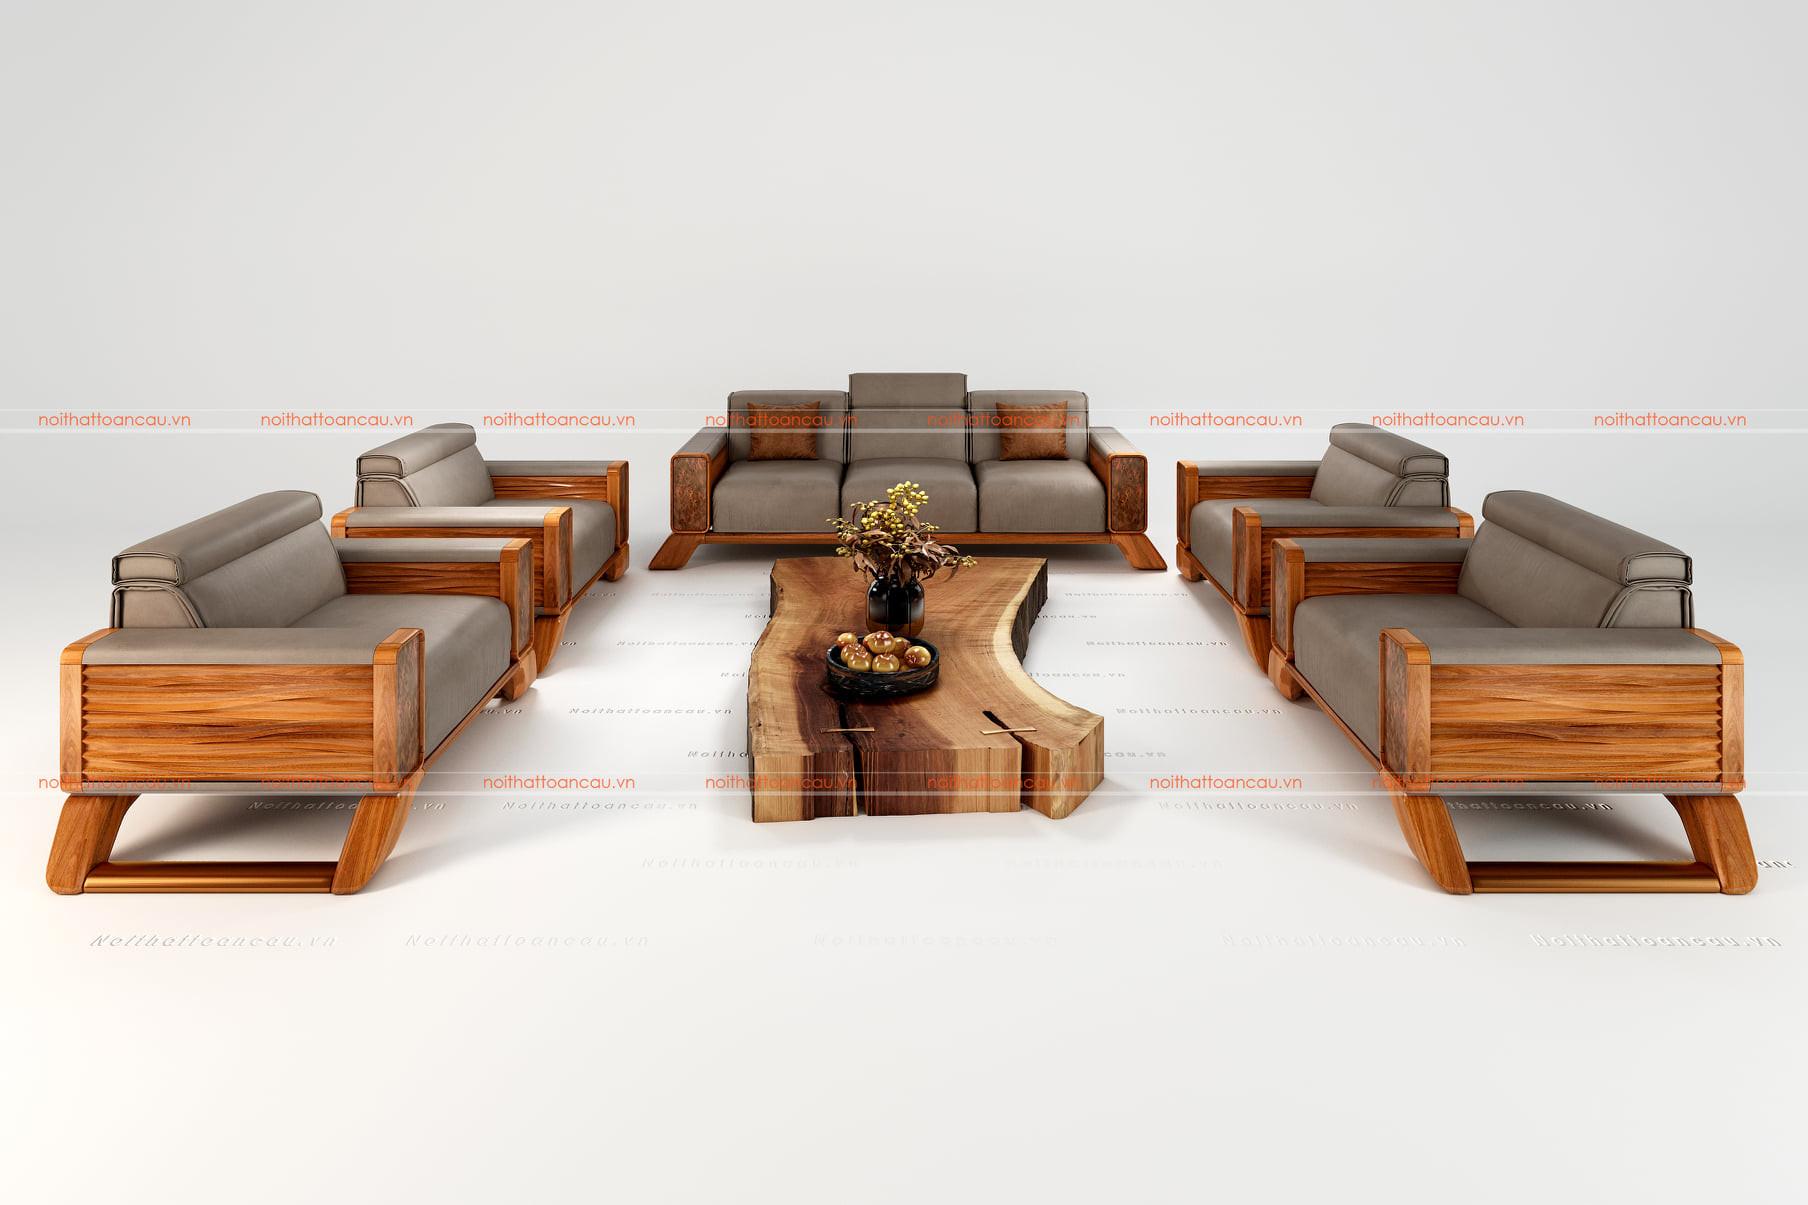 Bàn ghế gỗ gõ đỏ 1